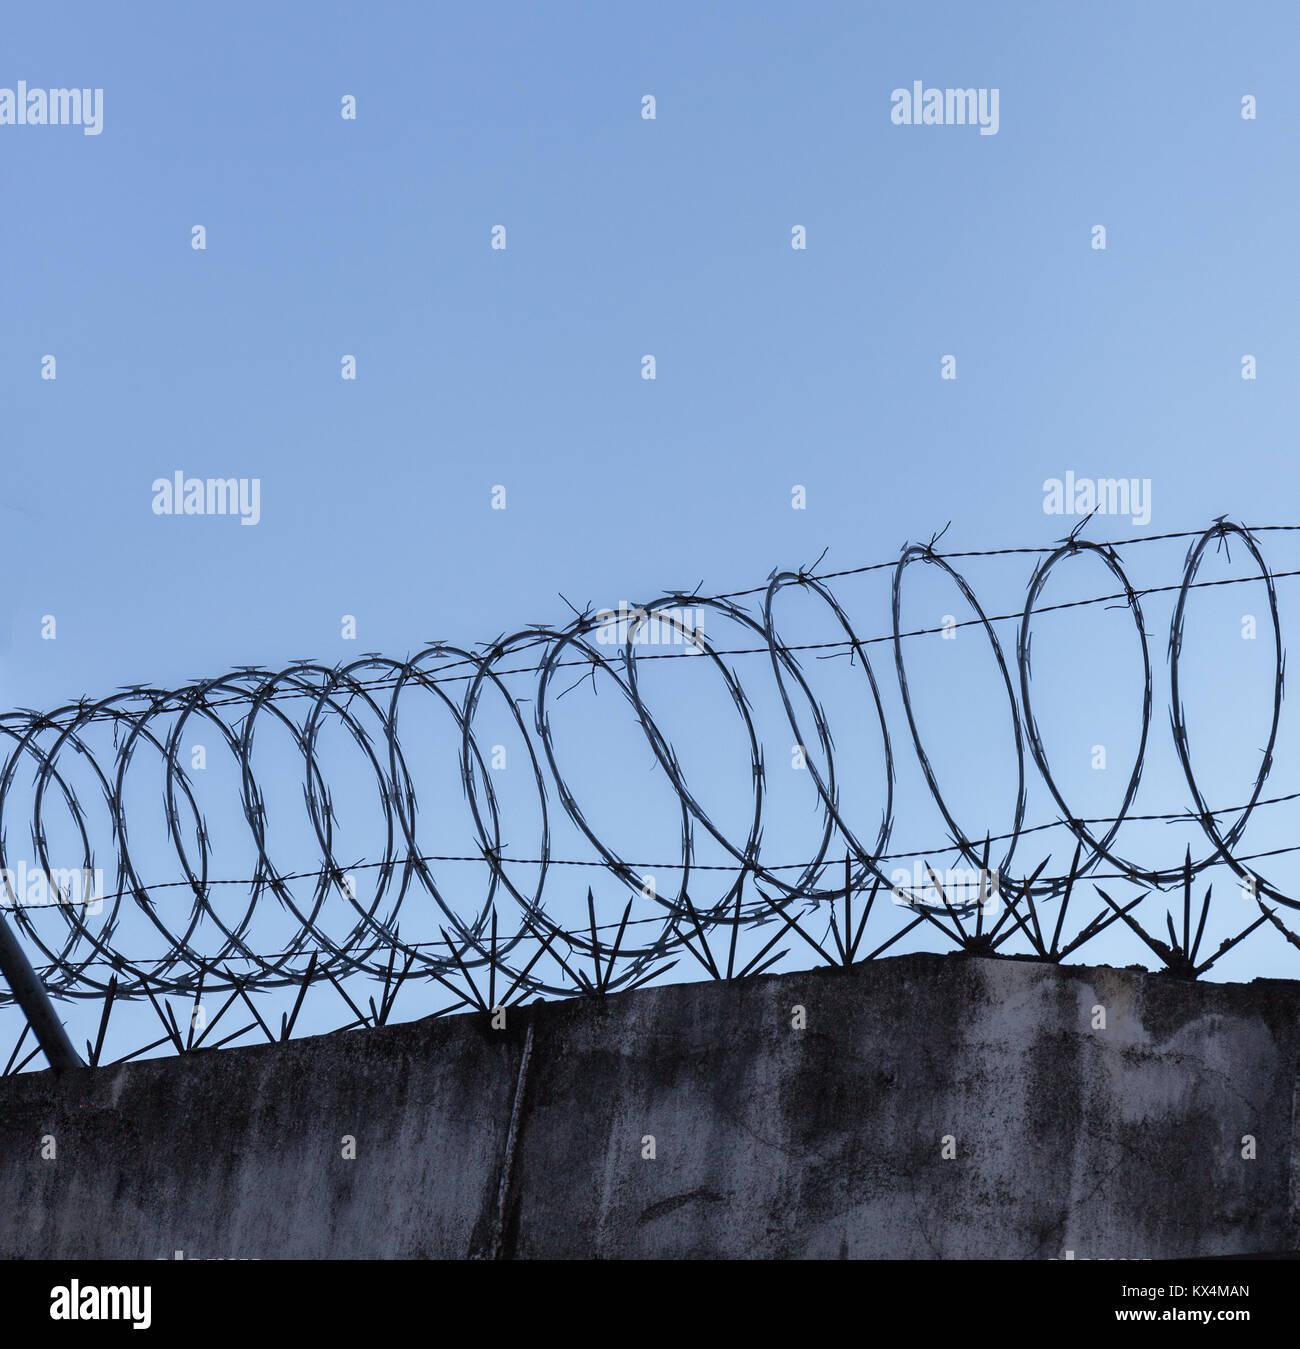 Barbed Wire Grunge Background Stock Photos & Barbed Wire Grunge ...